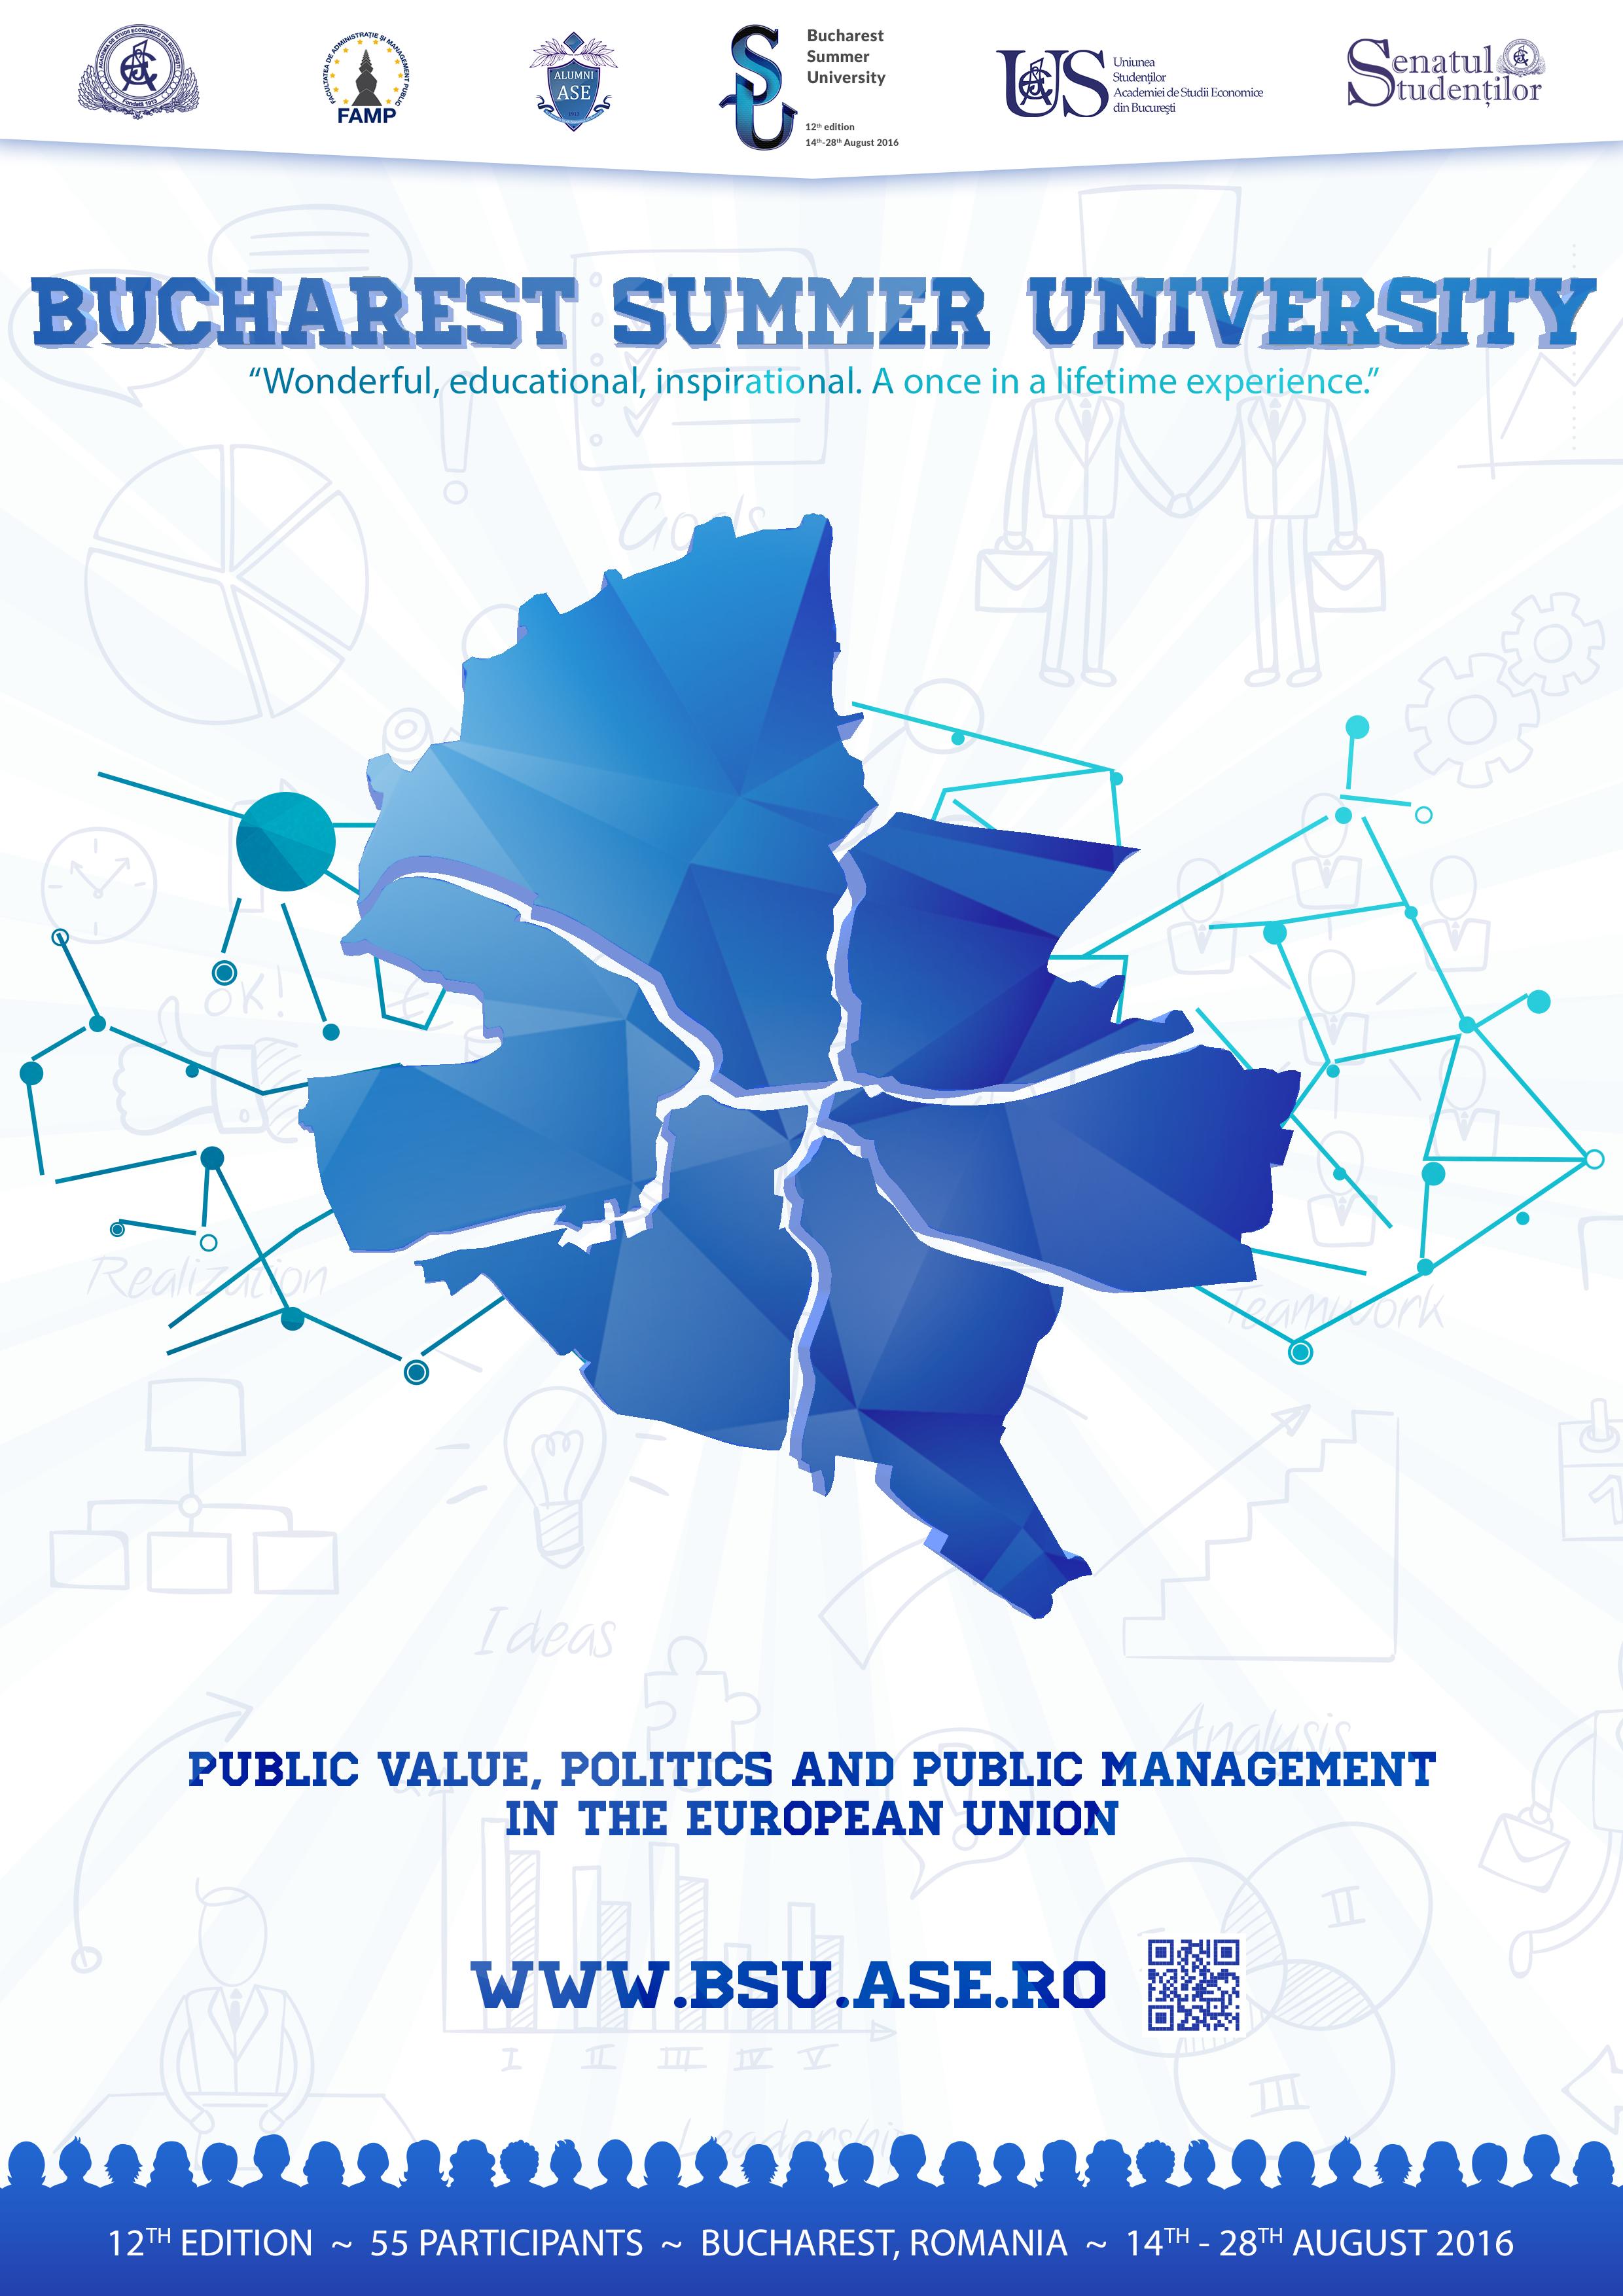 Bucharest Summer University revine cu cea de a XII-a ediție!